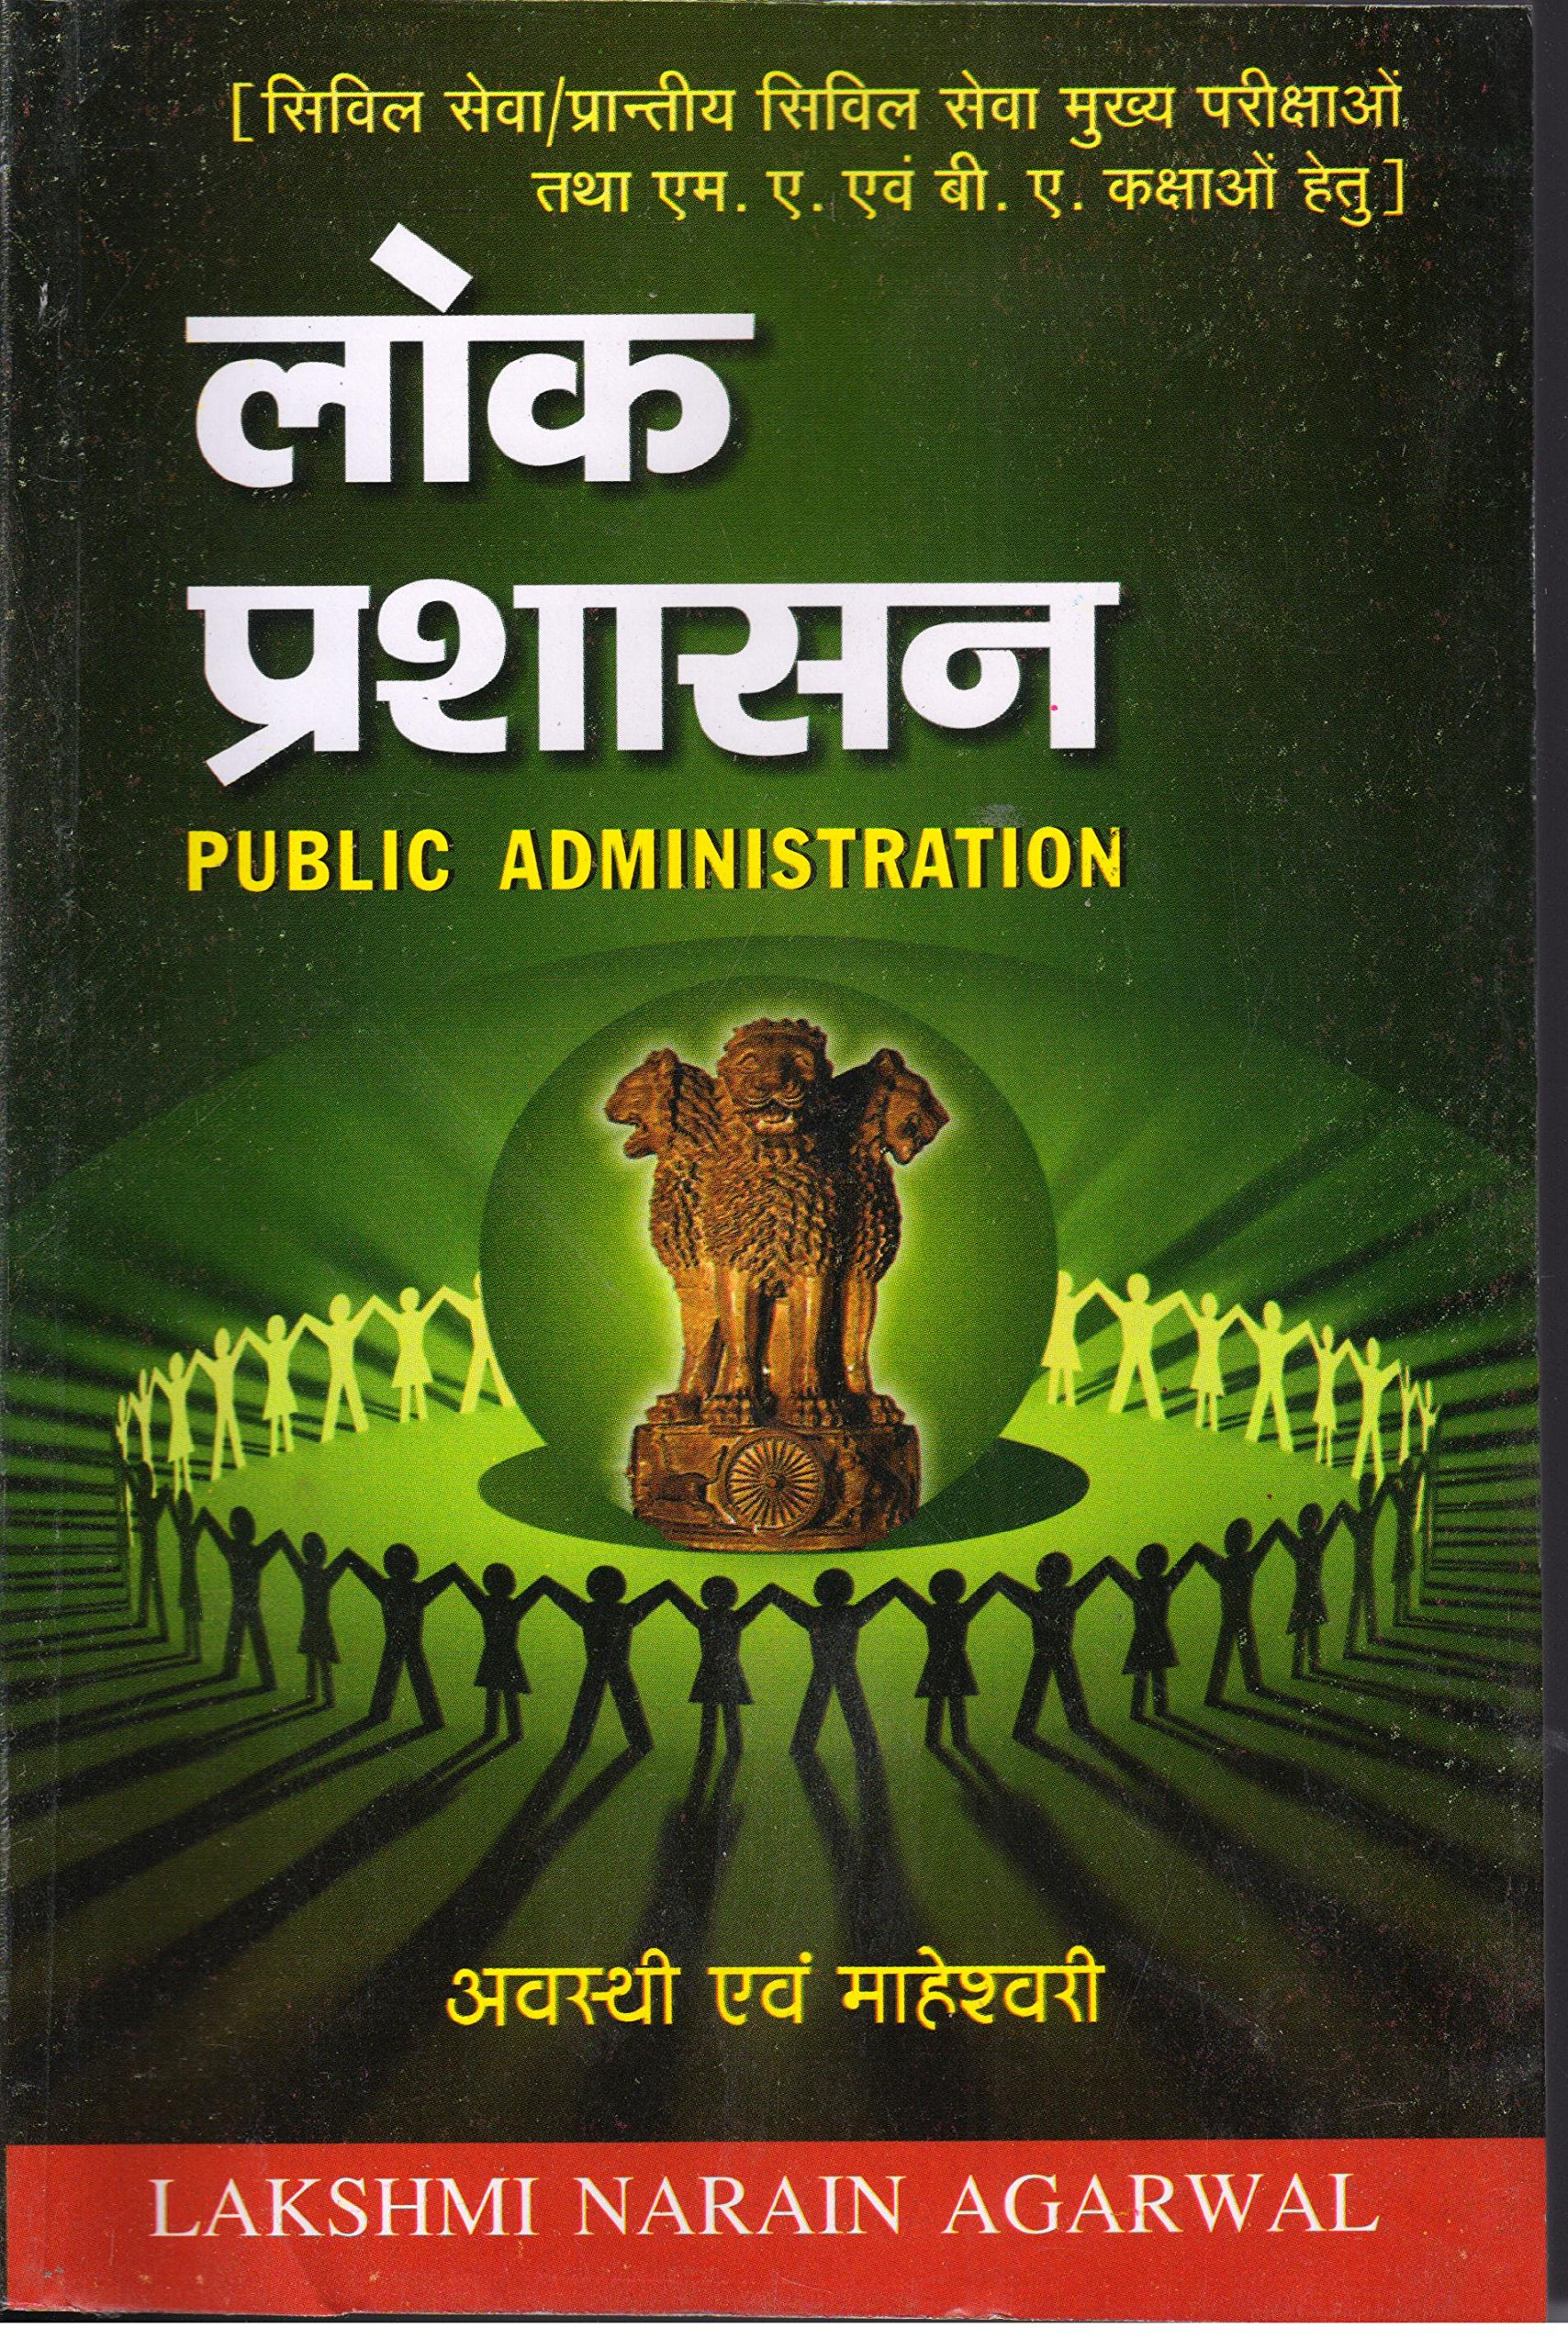 public books hindi upsc administration free